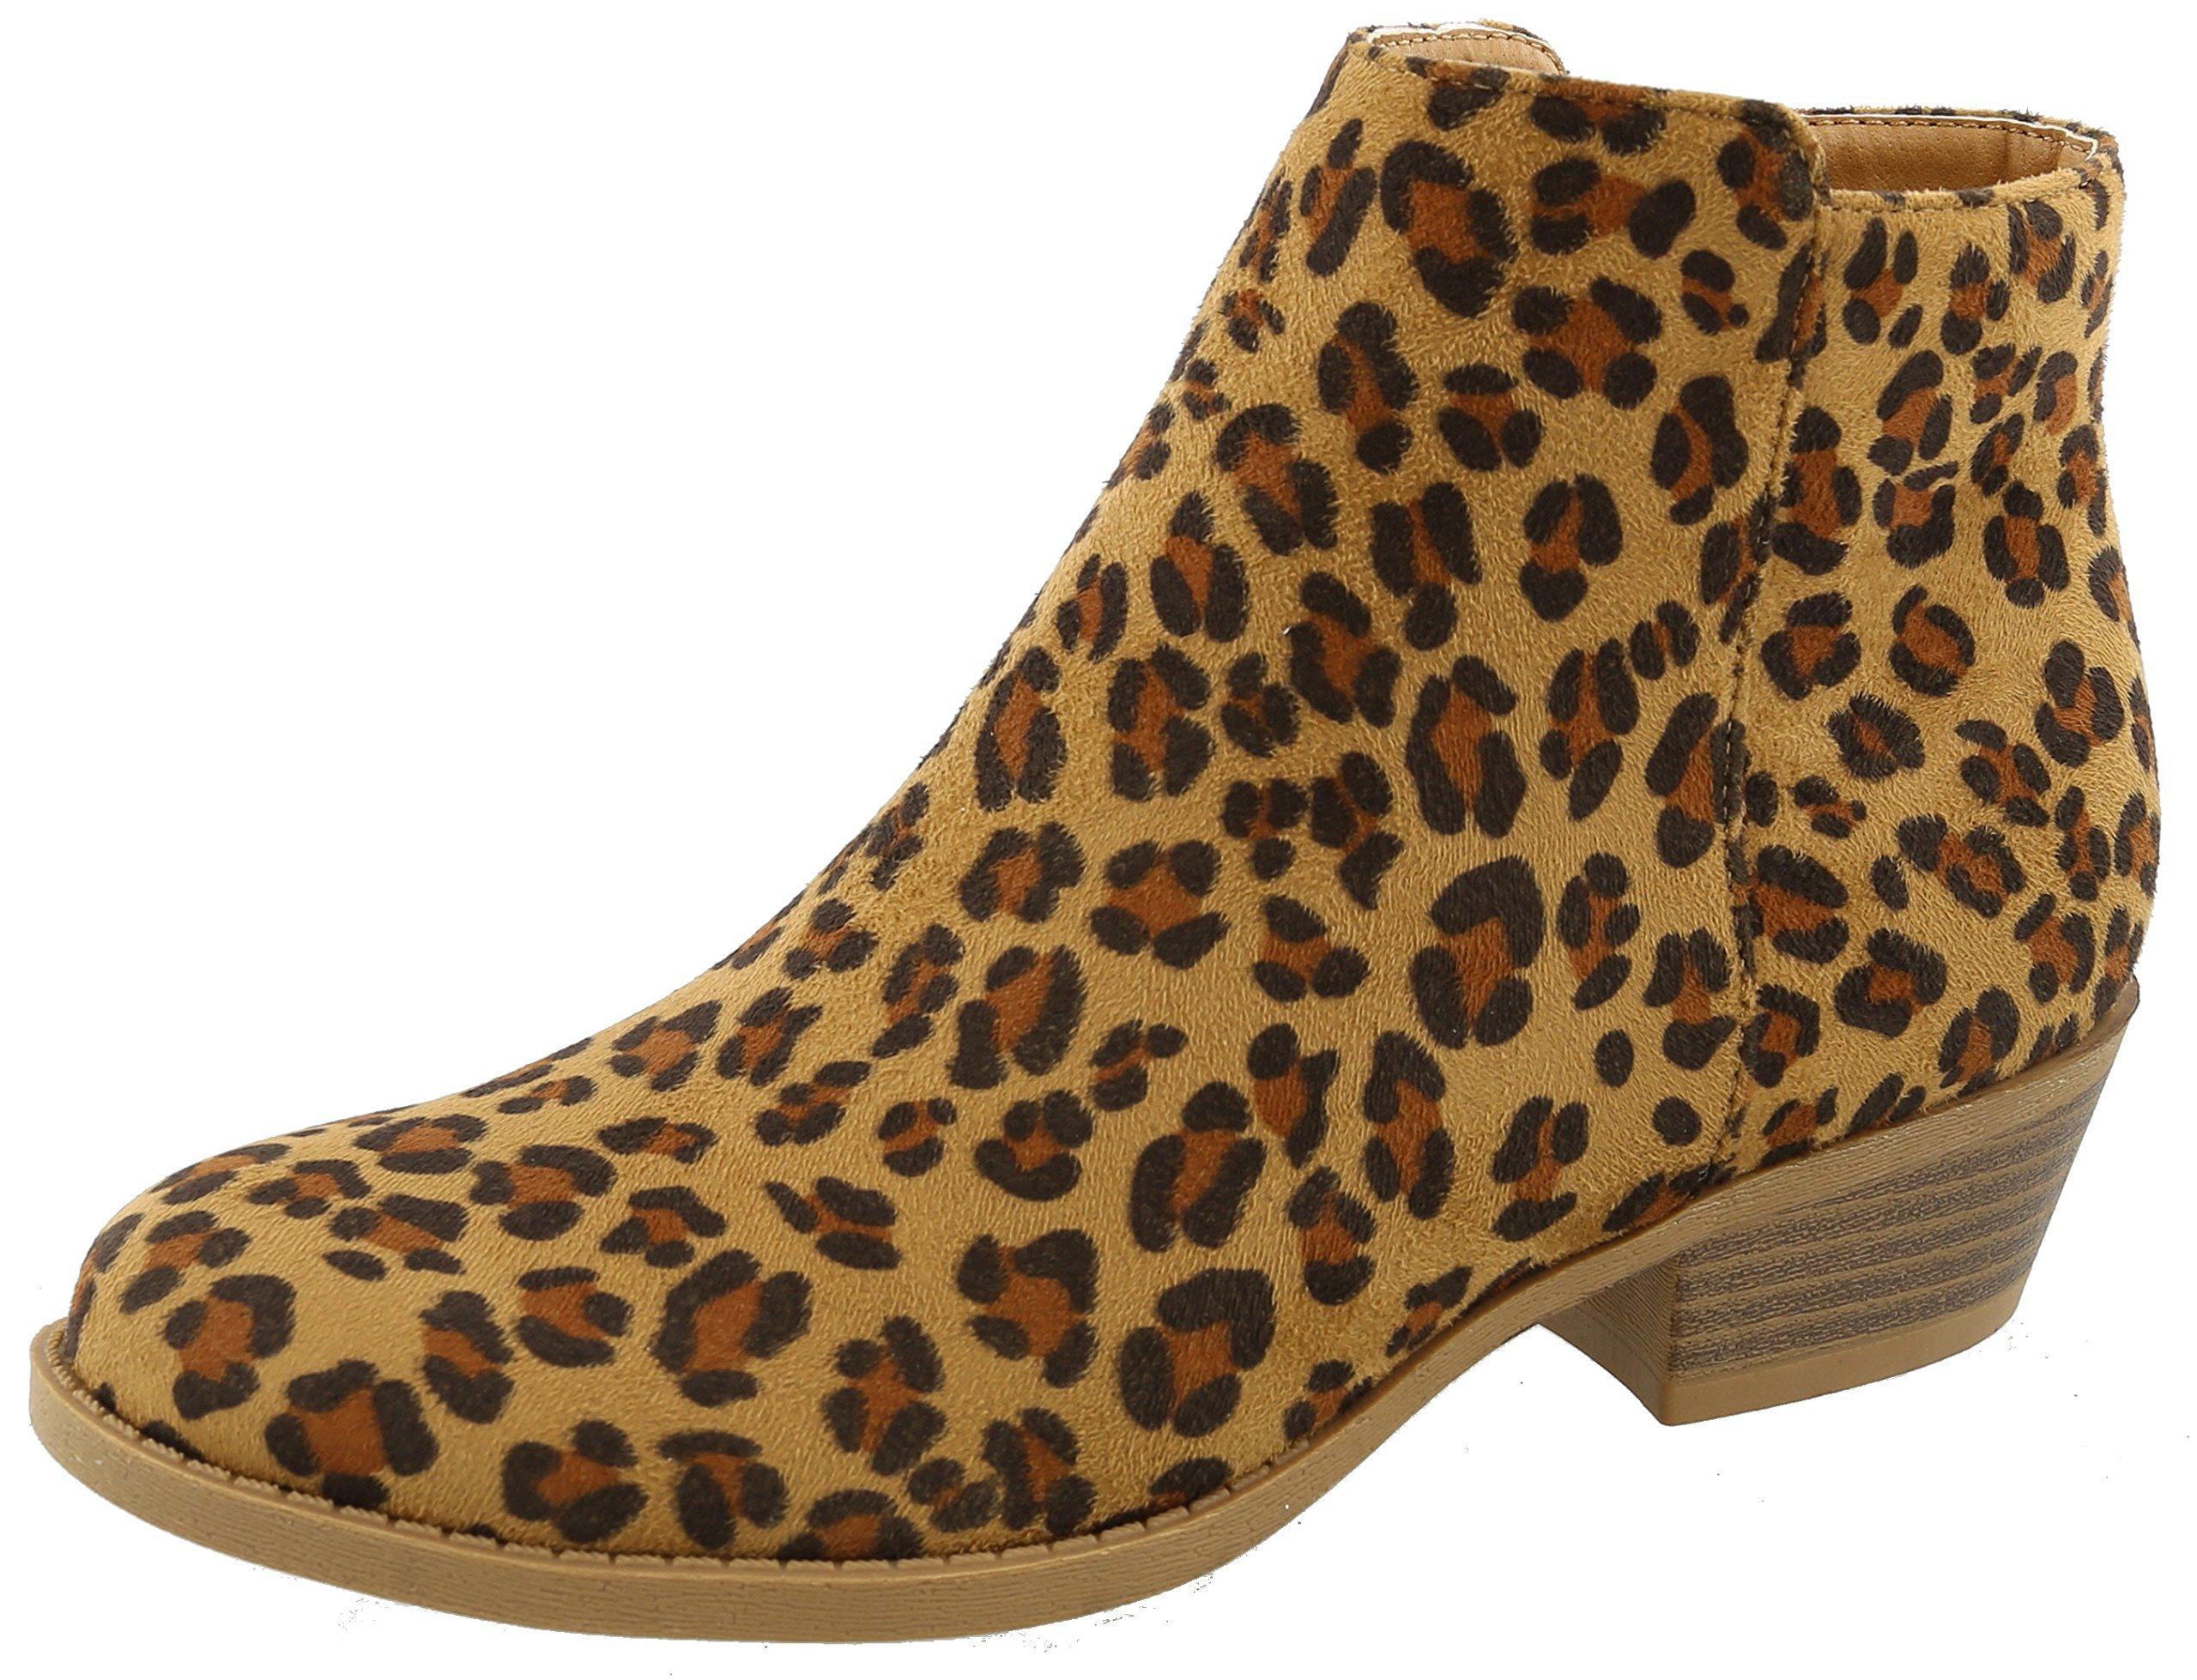 Top Moda Women's Inside Zip Round Toe Low Block Heel Ankle Bootie (5.5 B(M) US, Leopard)